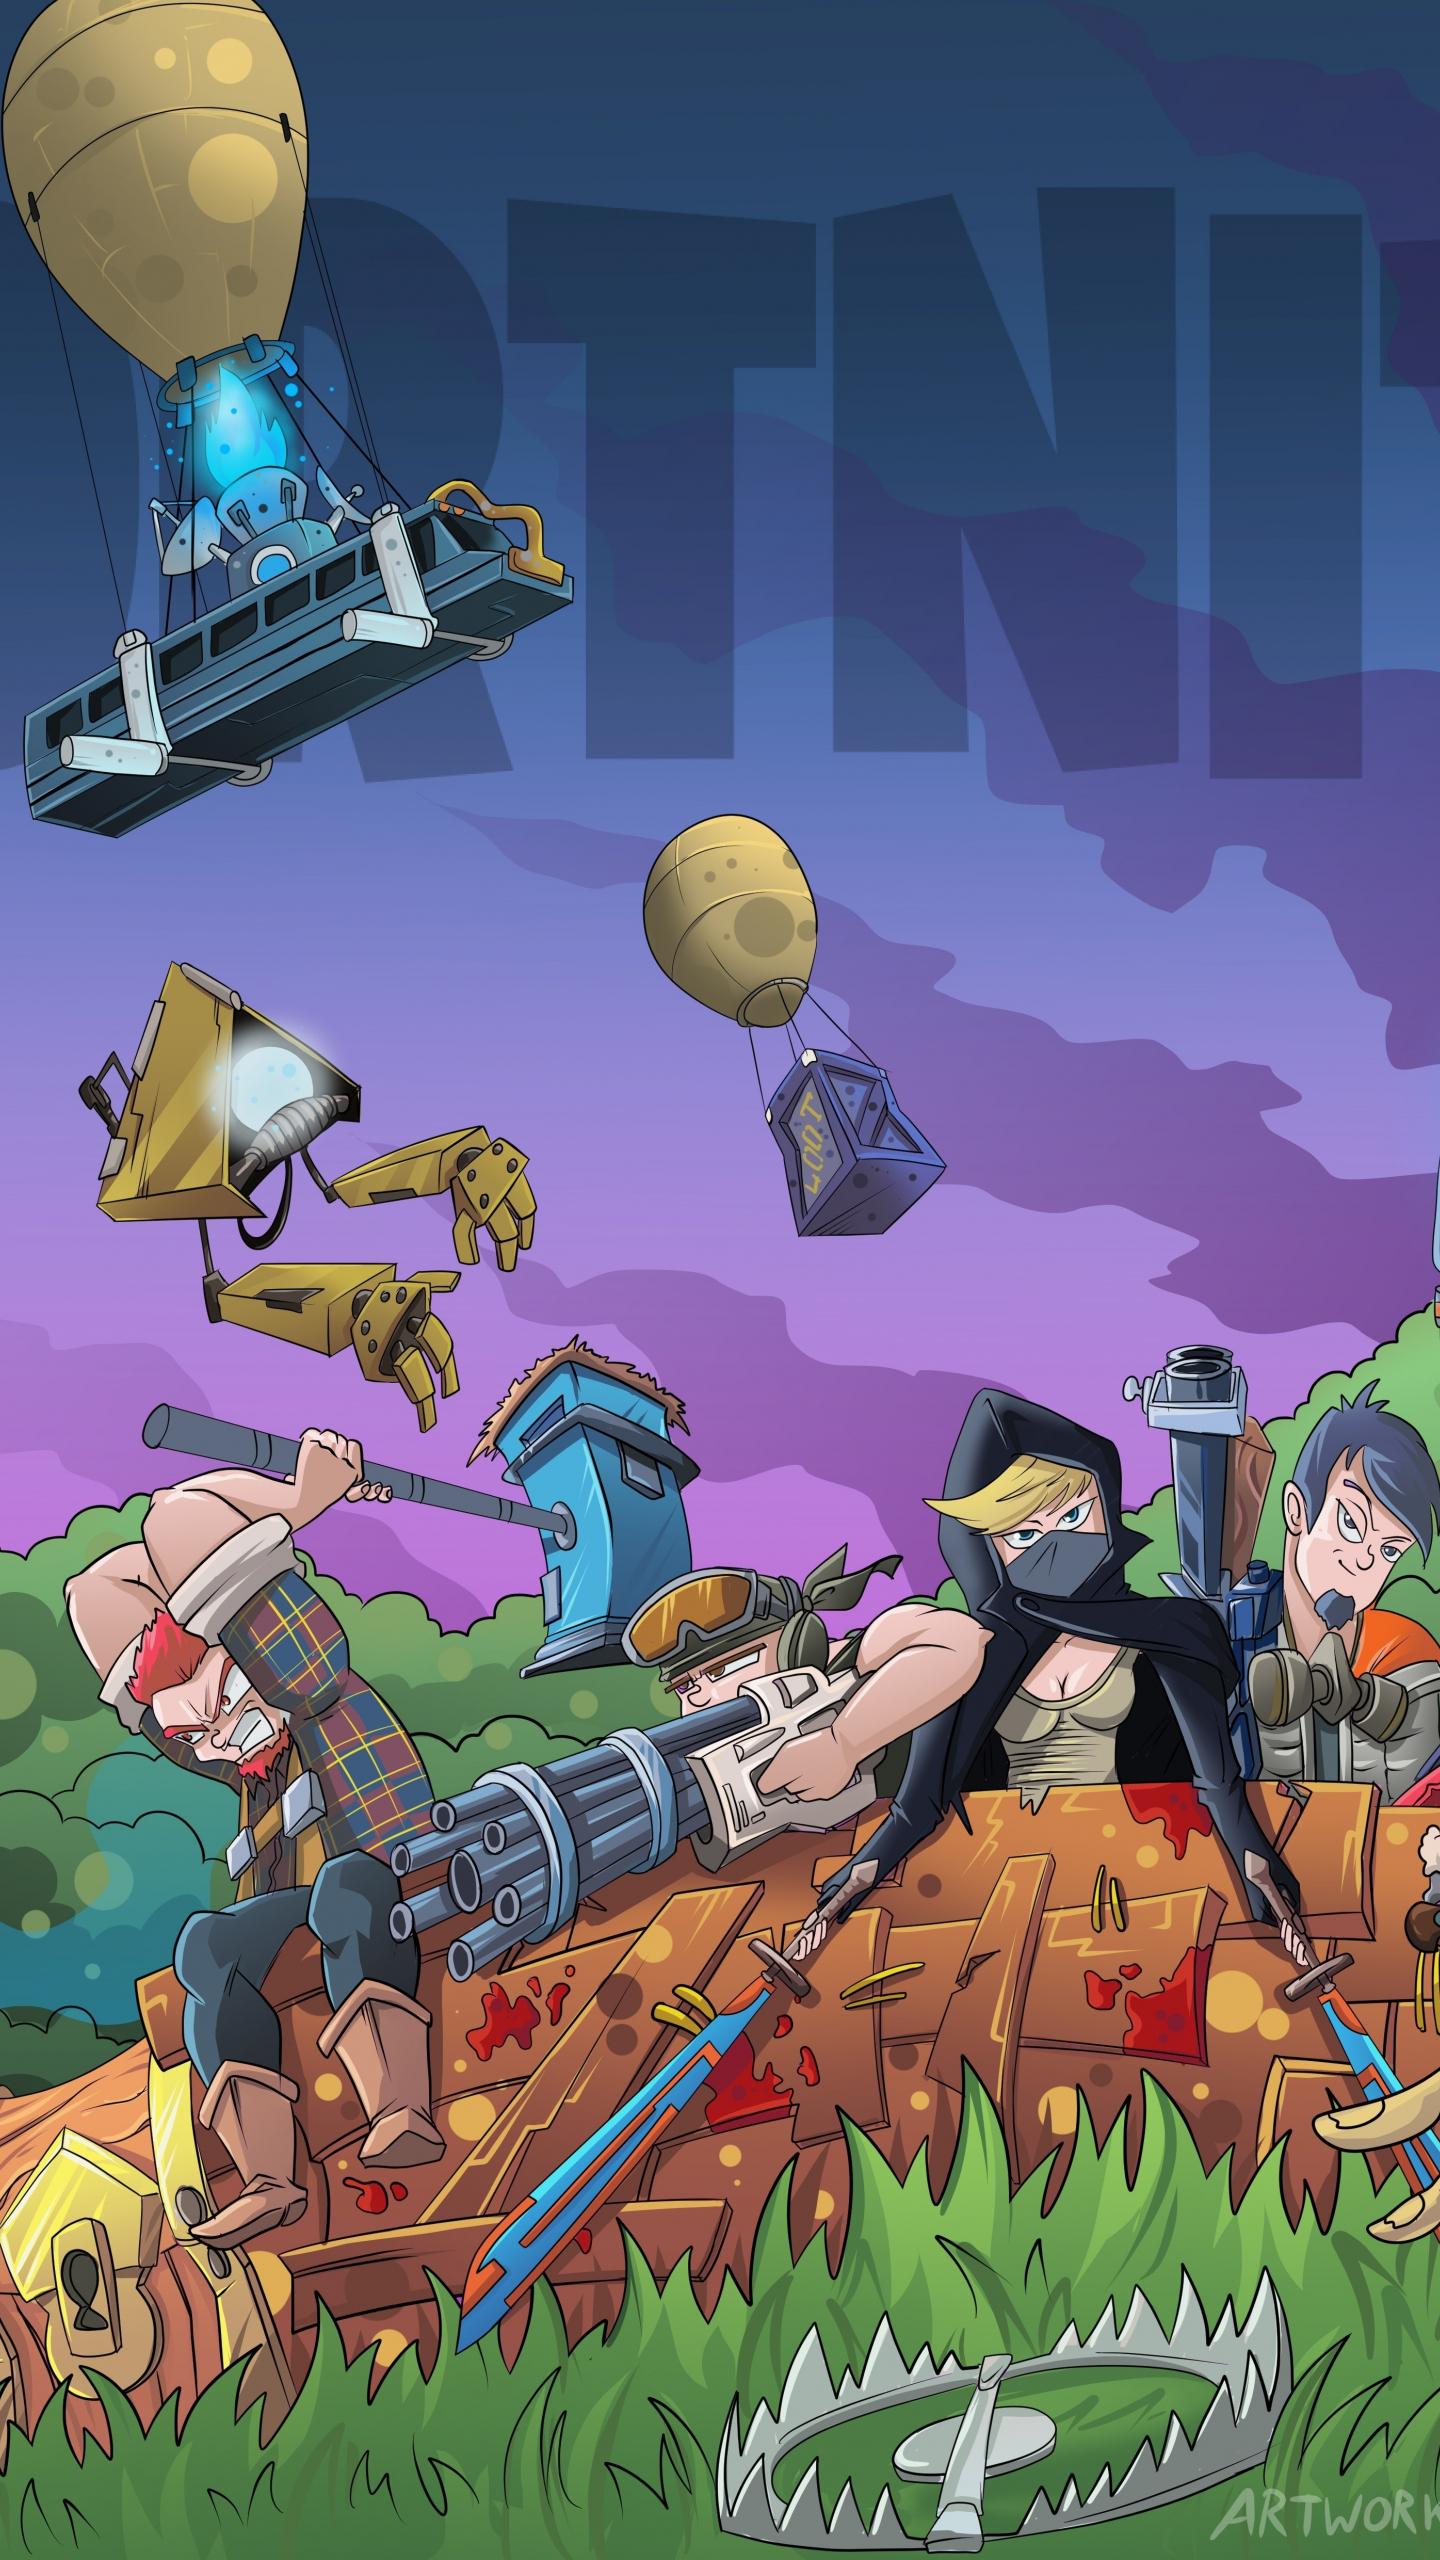 fortnite video game landscape 1440x2560 wallpaper - lg fortnite download